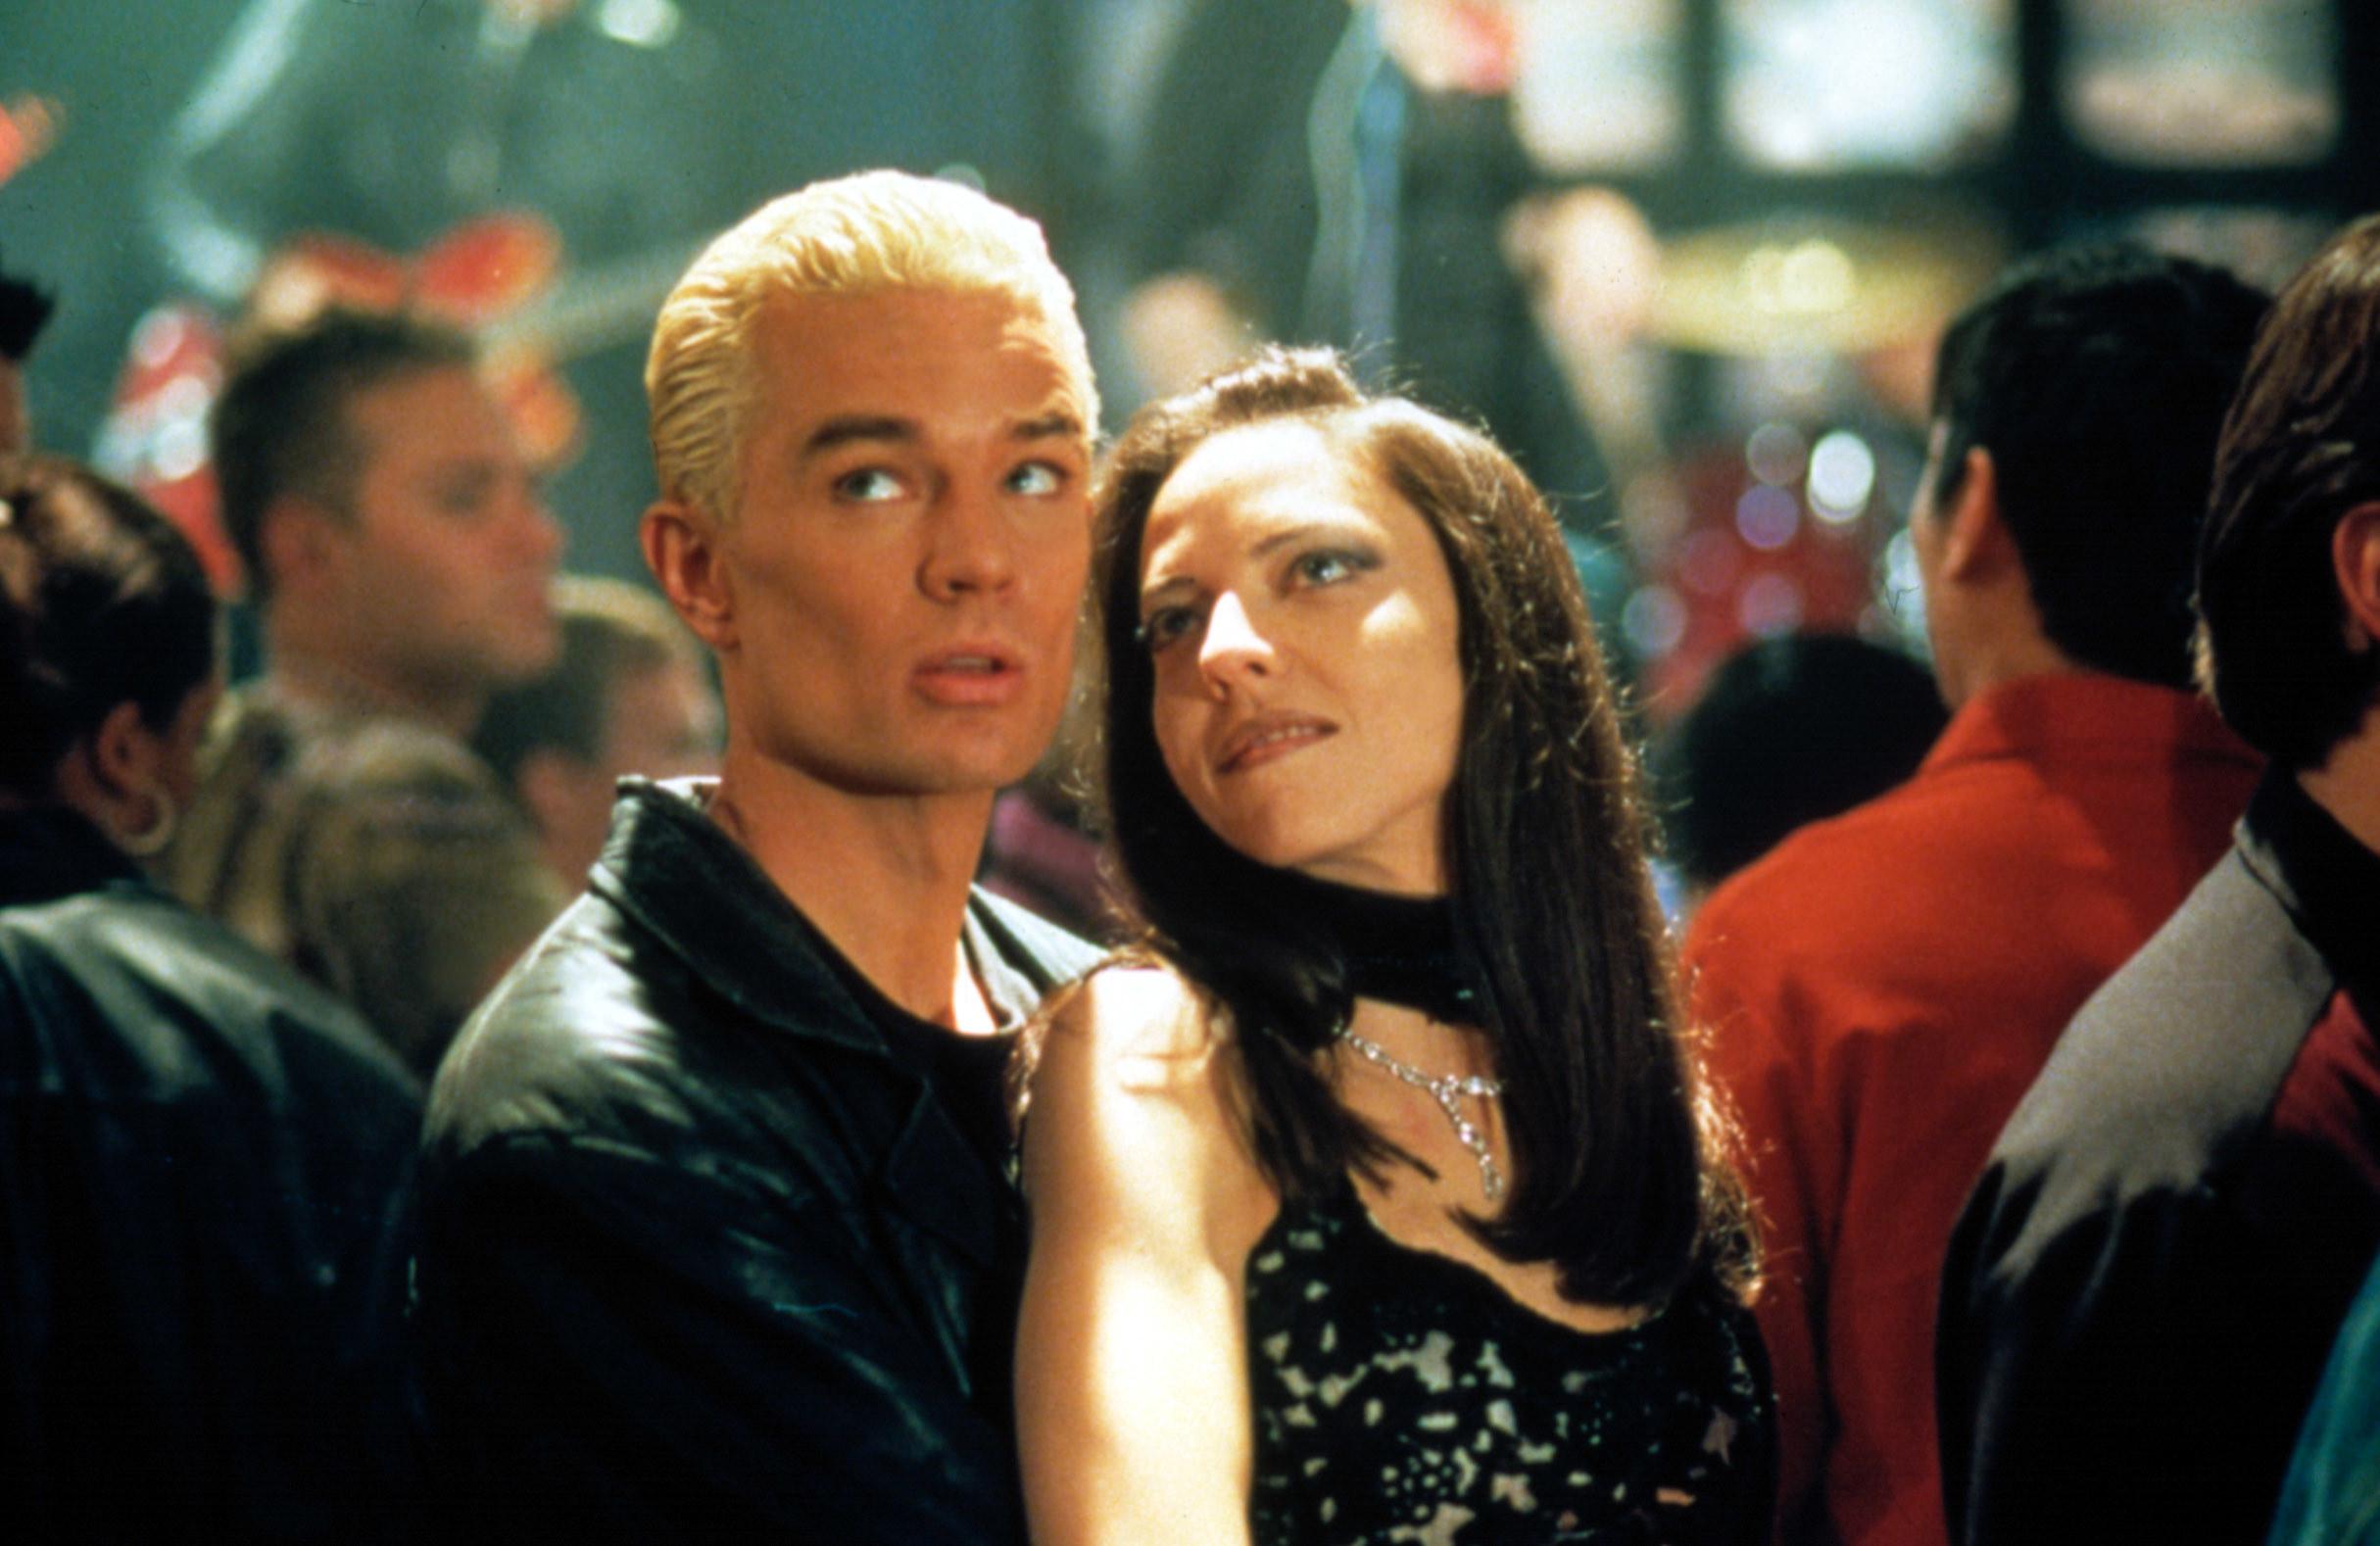 Spike with Drusilla at the Bronze nightclub